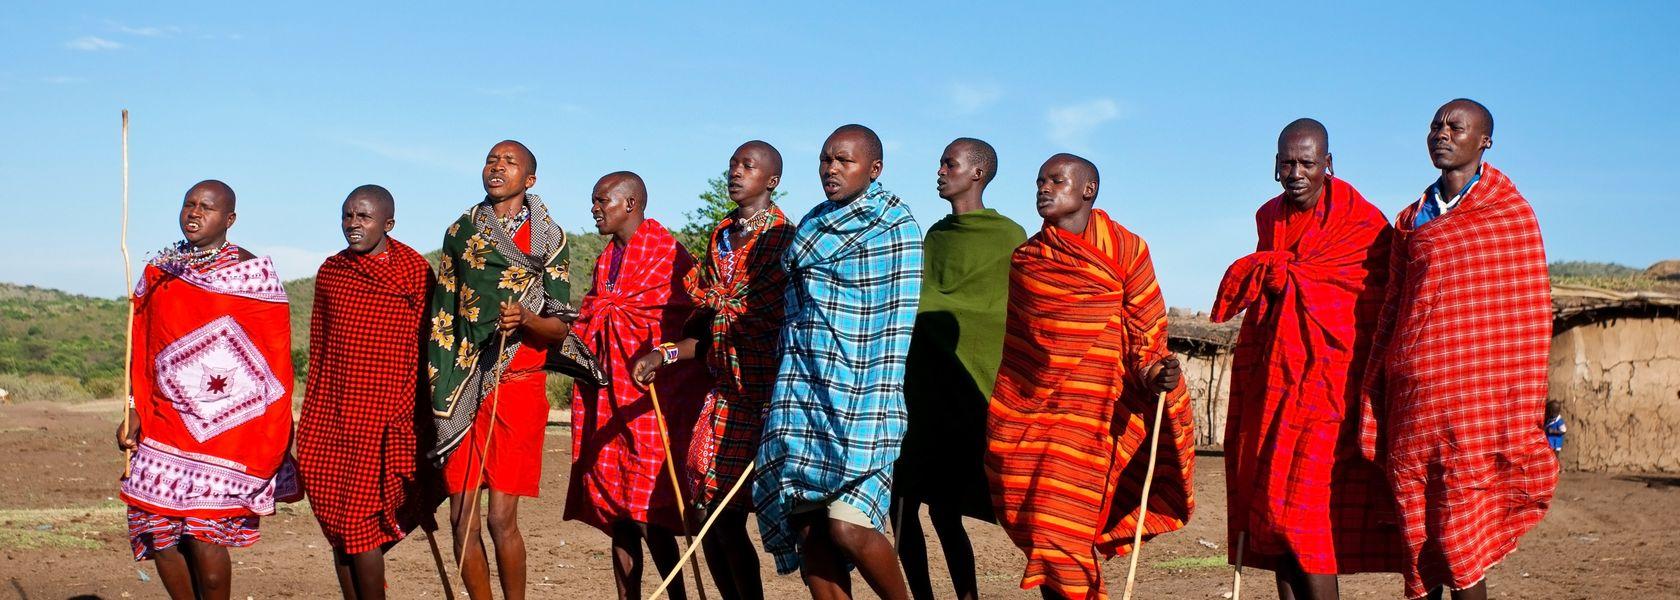 Corona en Kenia - Op reis in Kenia tijdens Corona tijd?